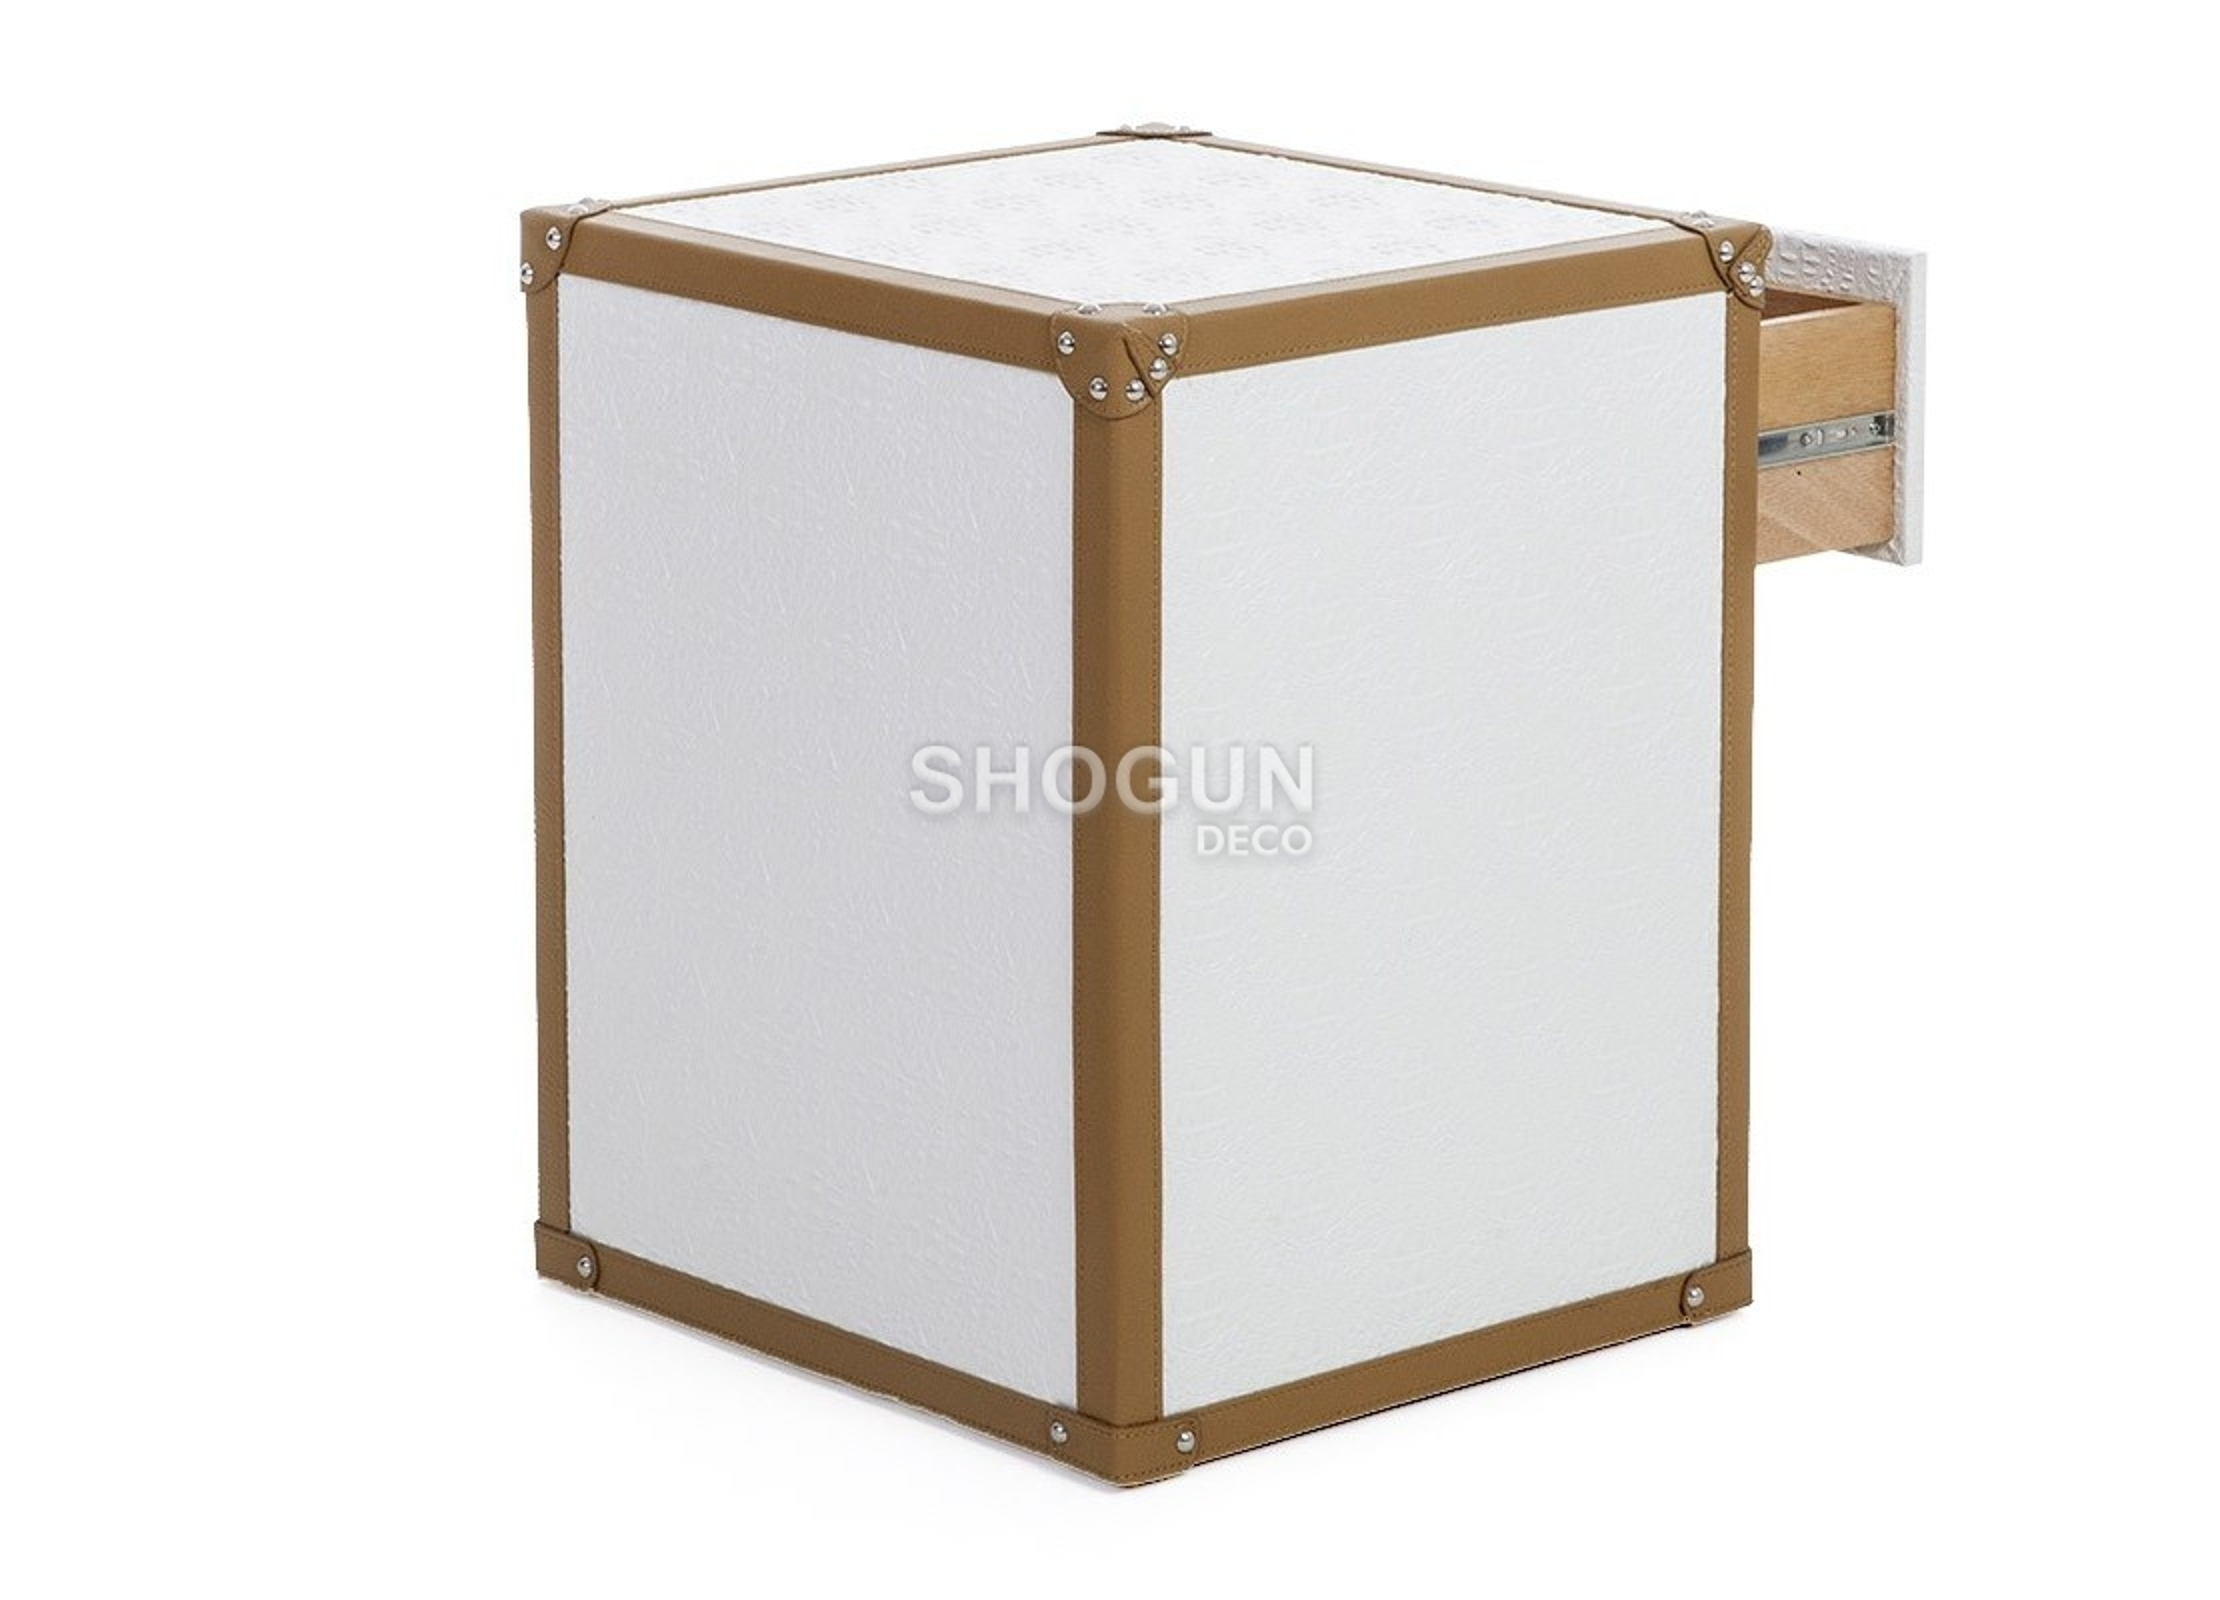 table chevet 1 tiroir et 1 niche en simili cuir croco blanc. Black Bedroom Furniture Sets. Home Design Ideas